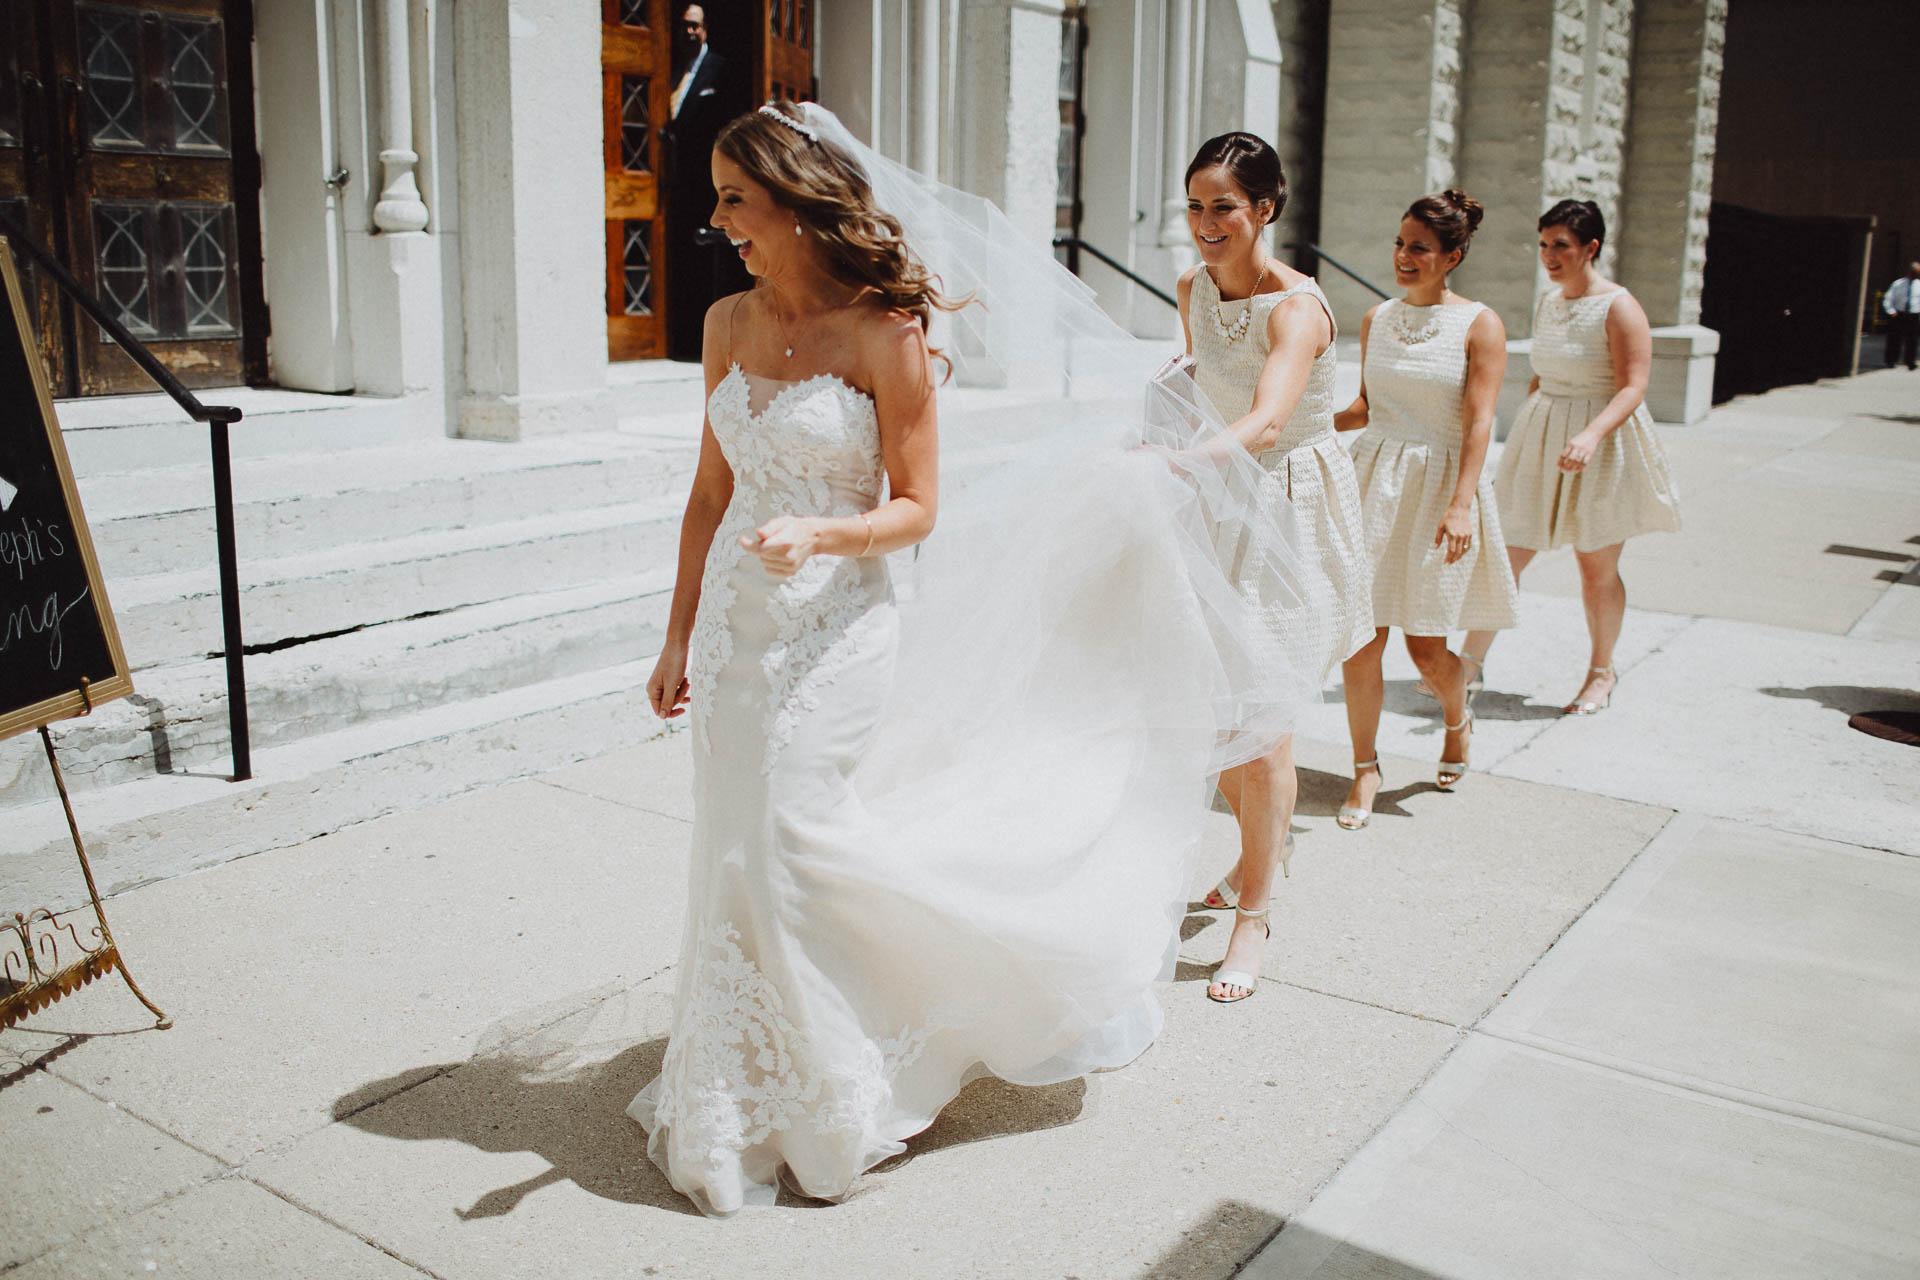 Keri-Joseph-Top-of-the-Market-Wedding-050@2x.jpg